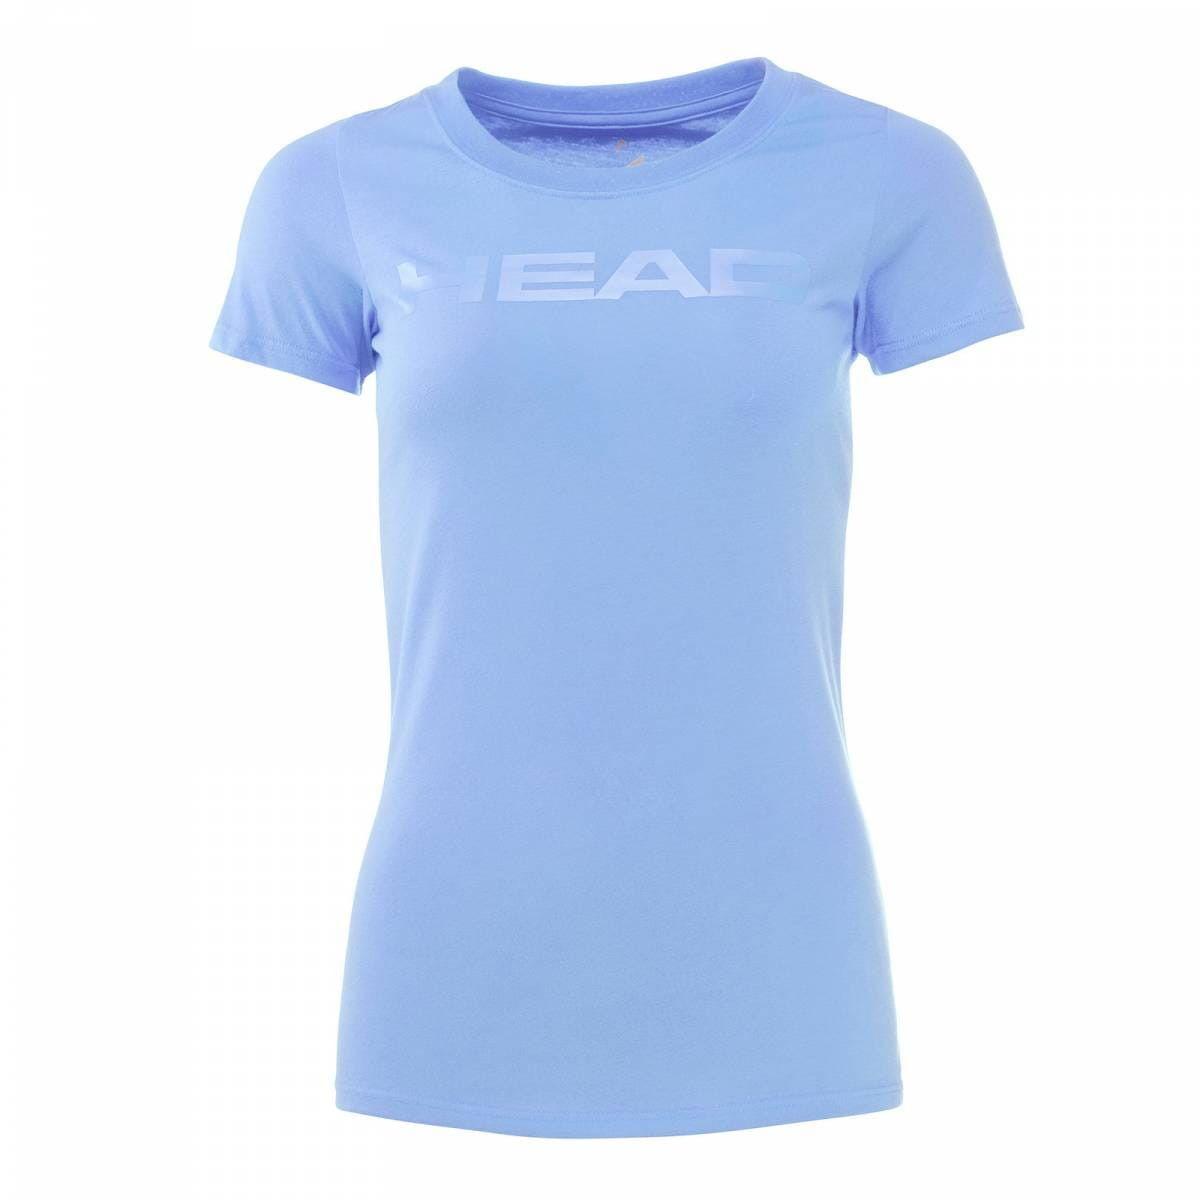 Head Mona T-Shirt W - sky blue